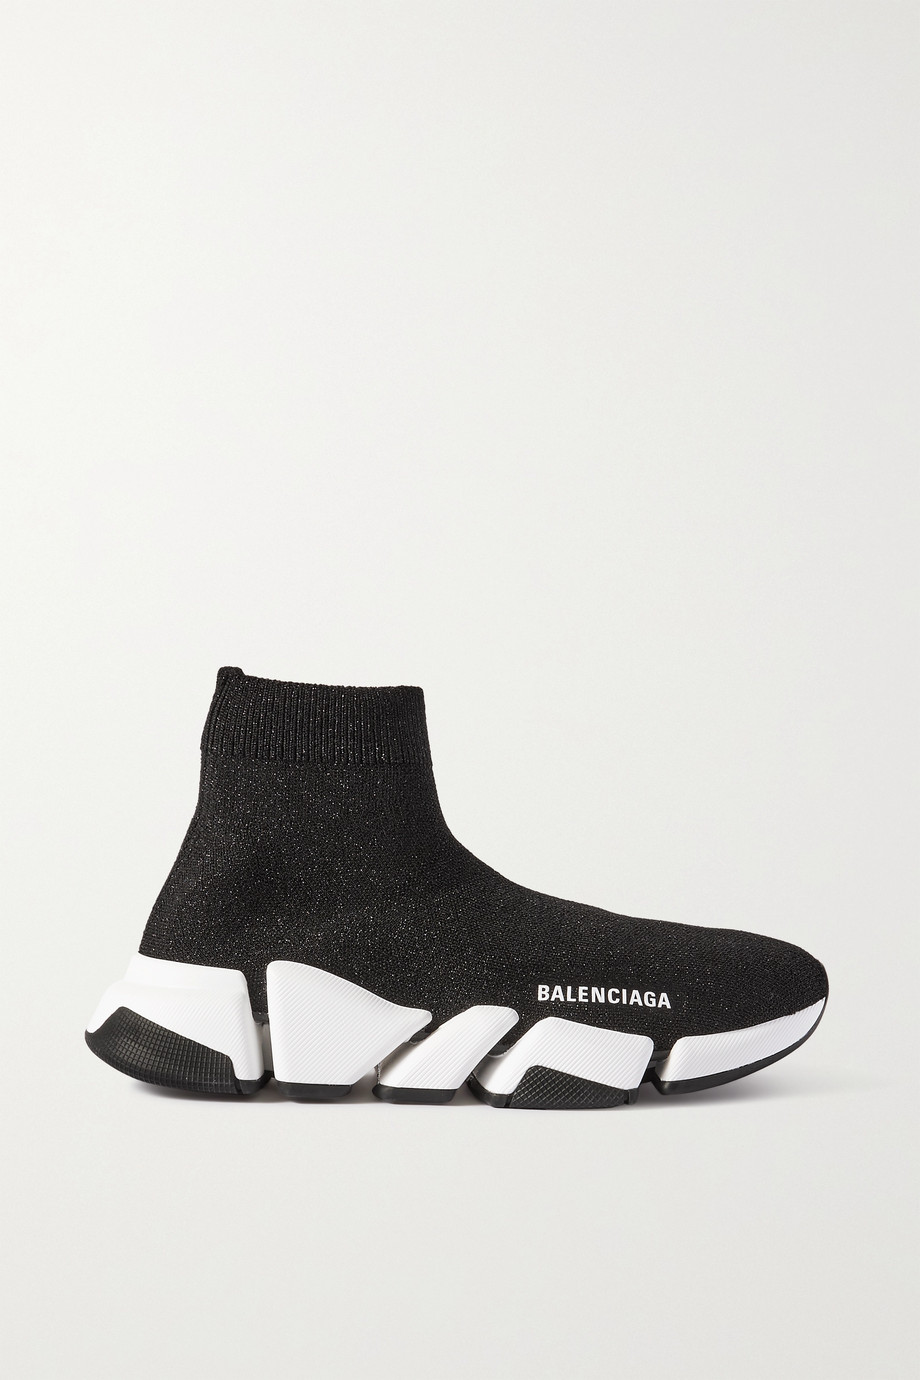 Balenciaga Speed 2.0 logo-print glittered stretch-knit high-top sneakers